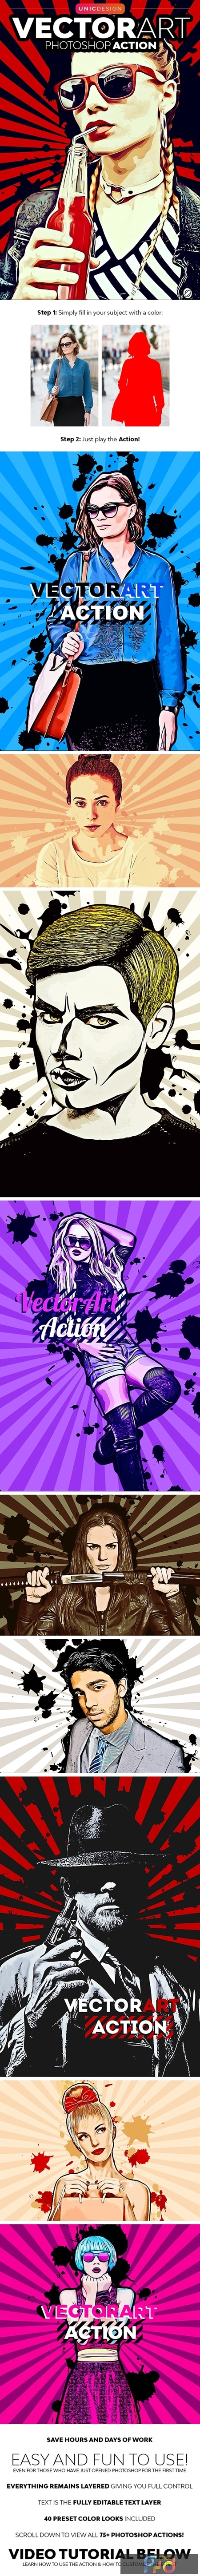 VectorArt Photoshop Action 23467041 1